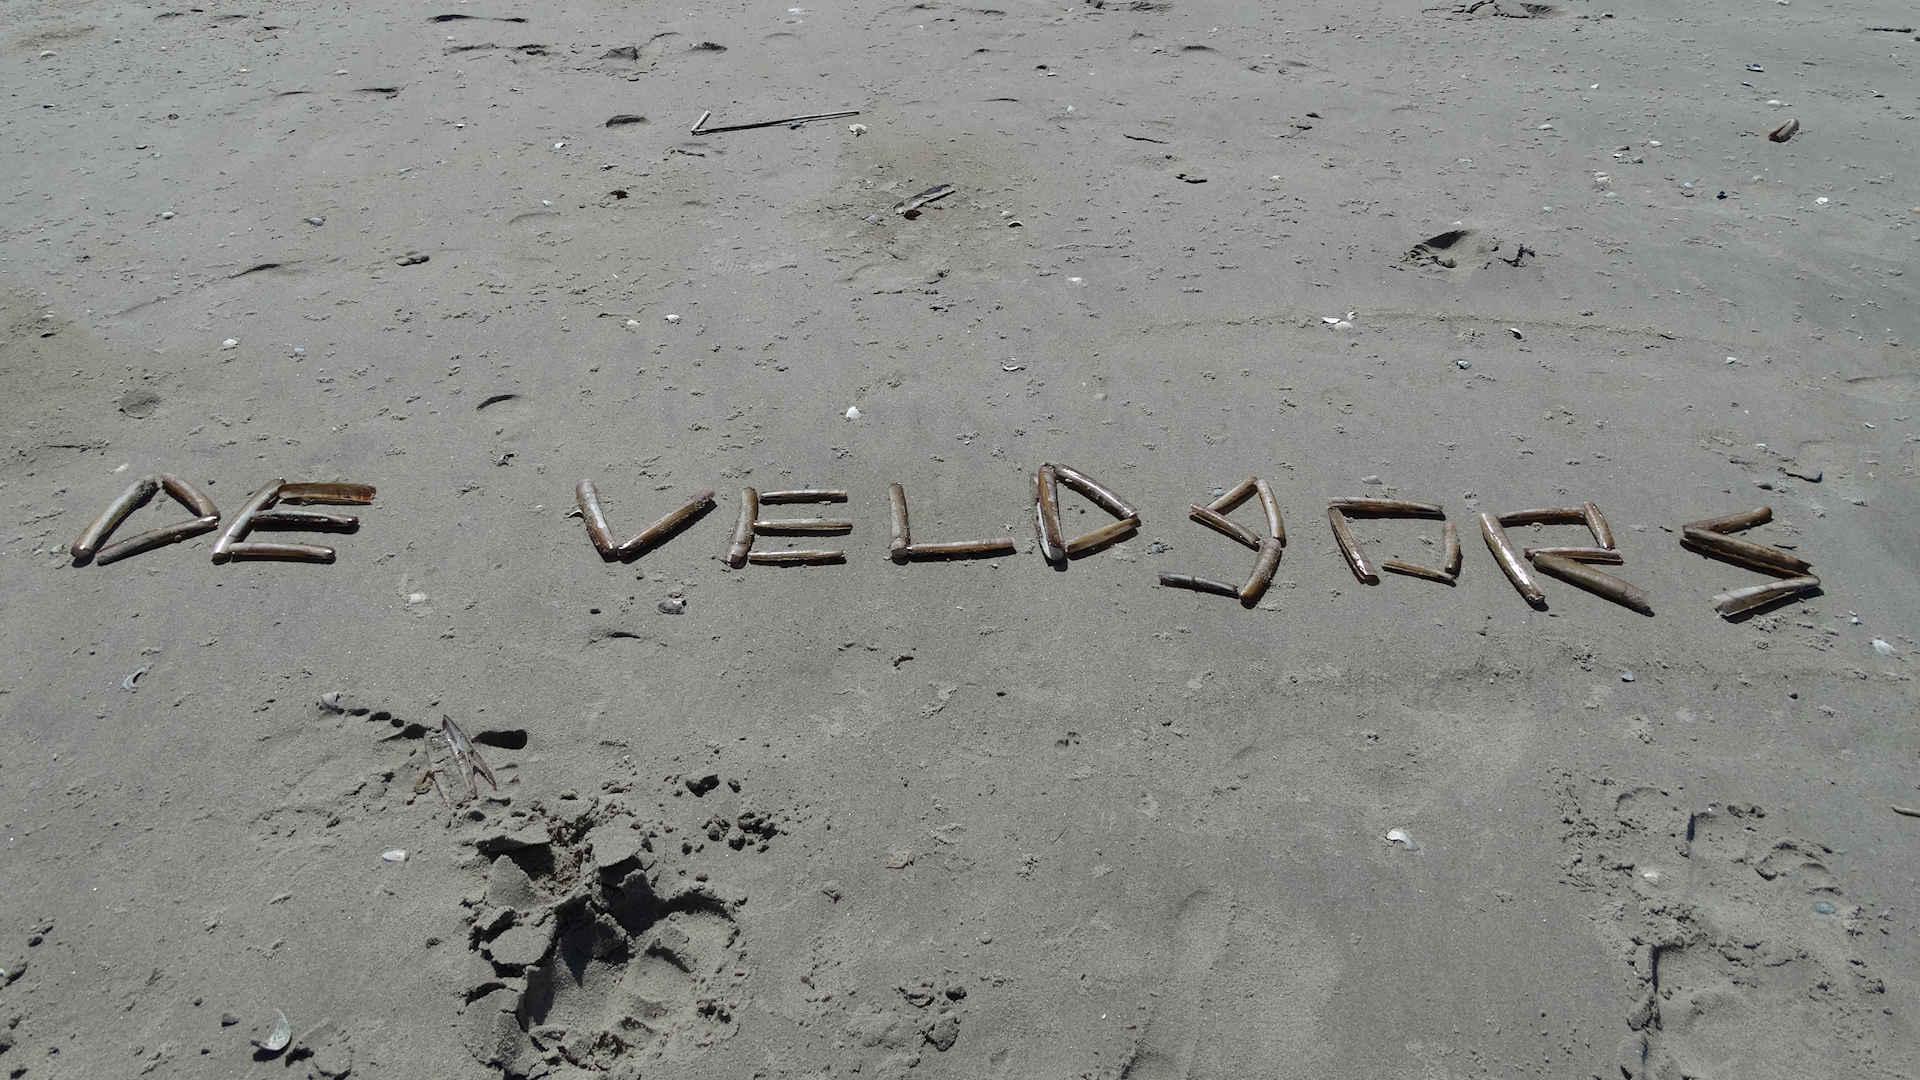 Vakantiebungalow De Veldgors - Vakantiebungalows Ameland